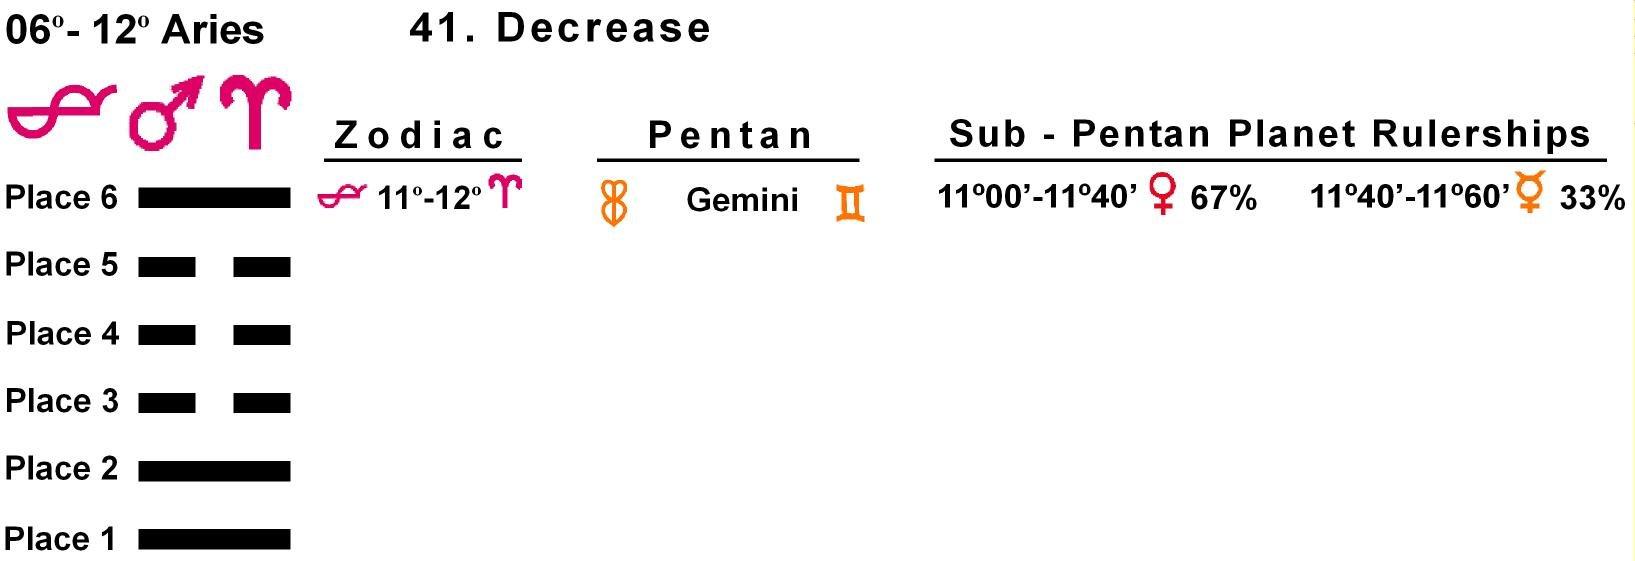 Pent-lines-01AR 11-12 Hx-41 Decrease